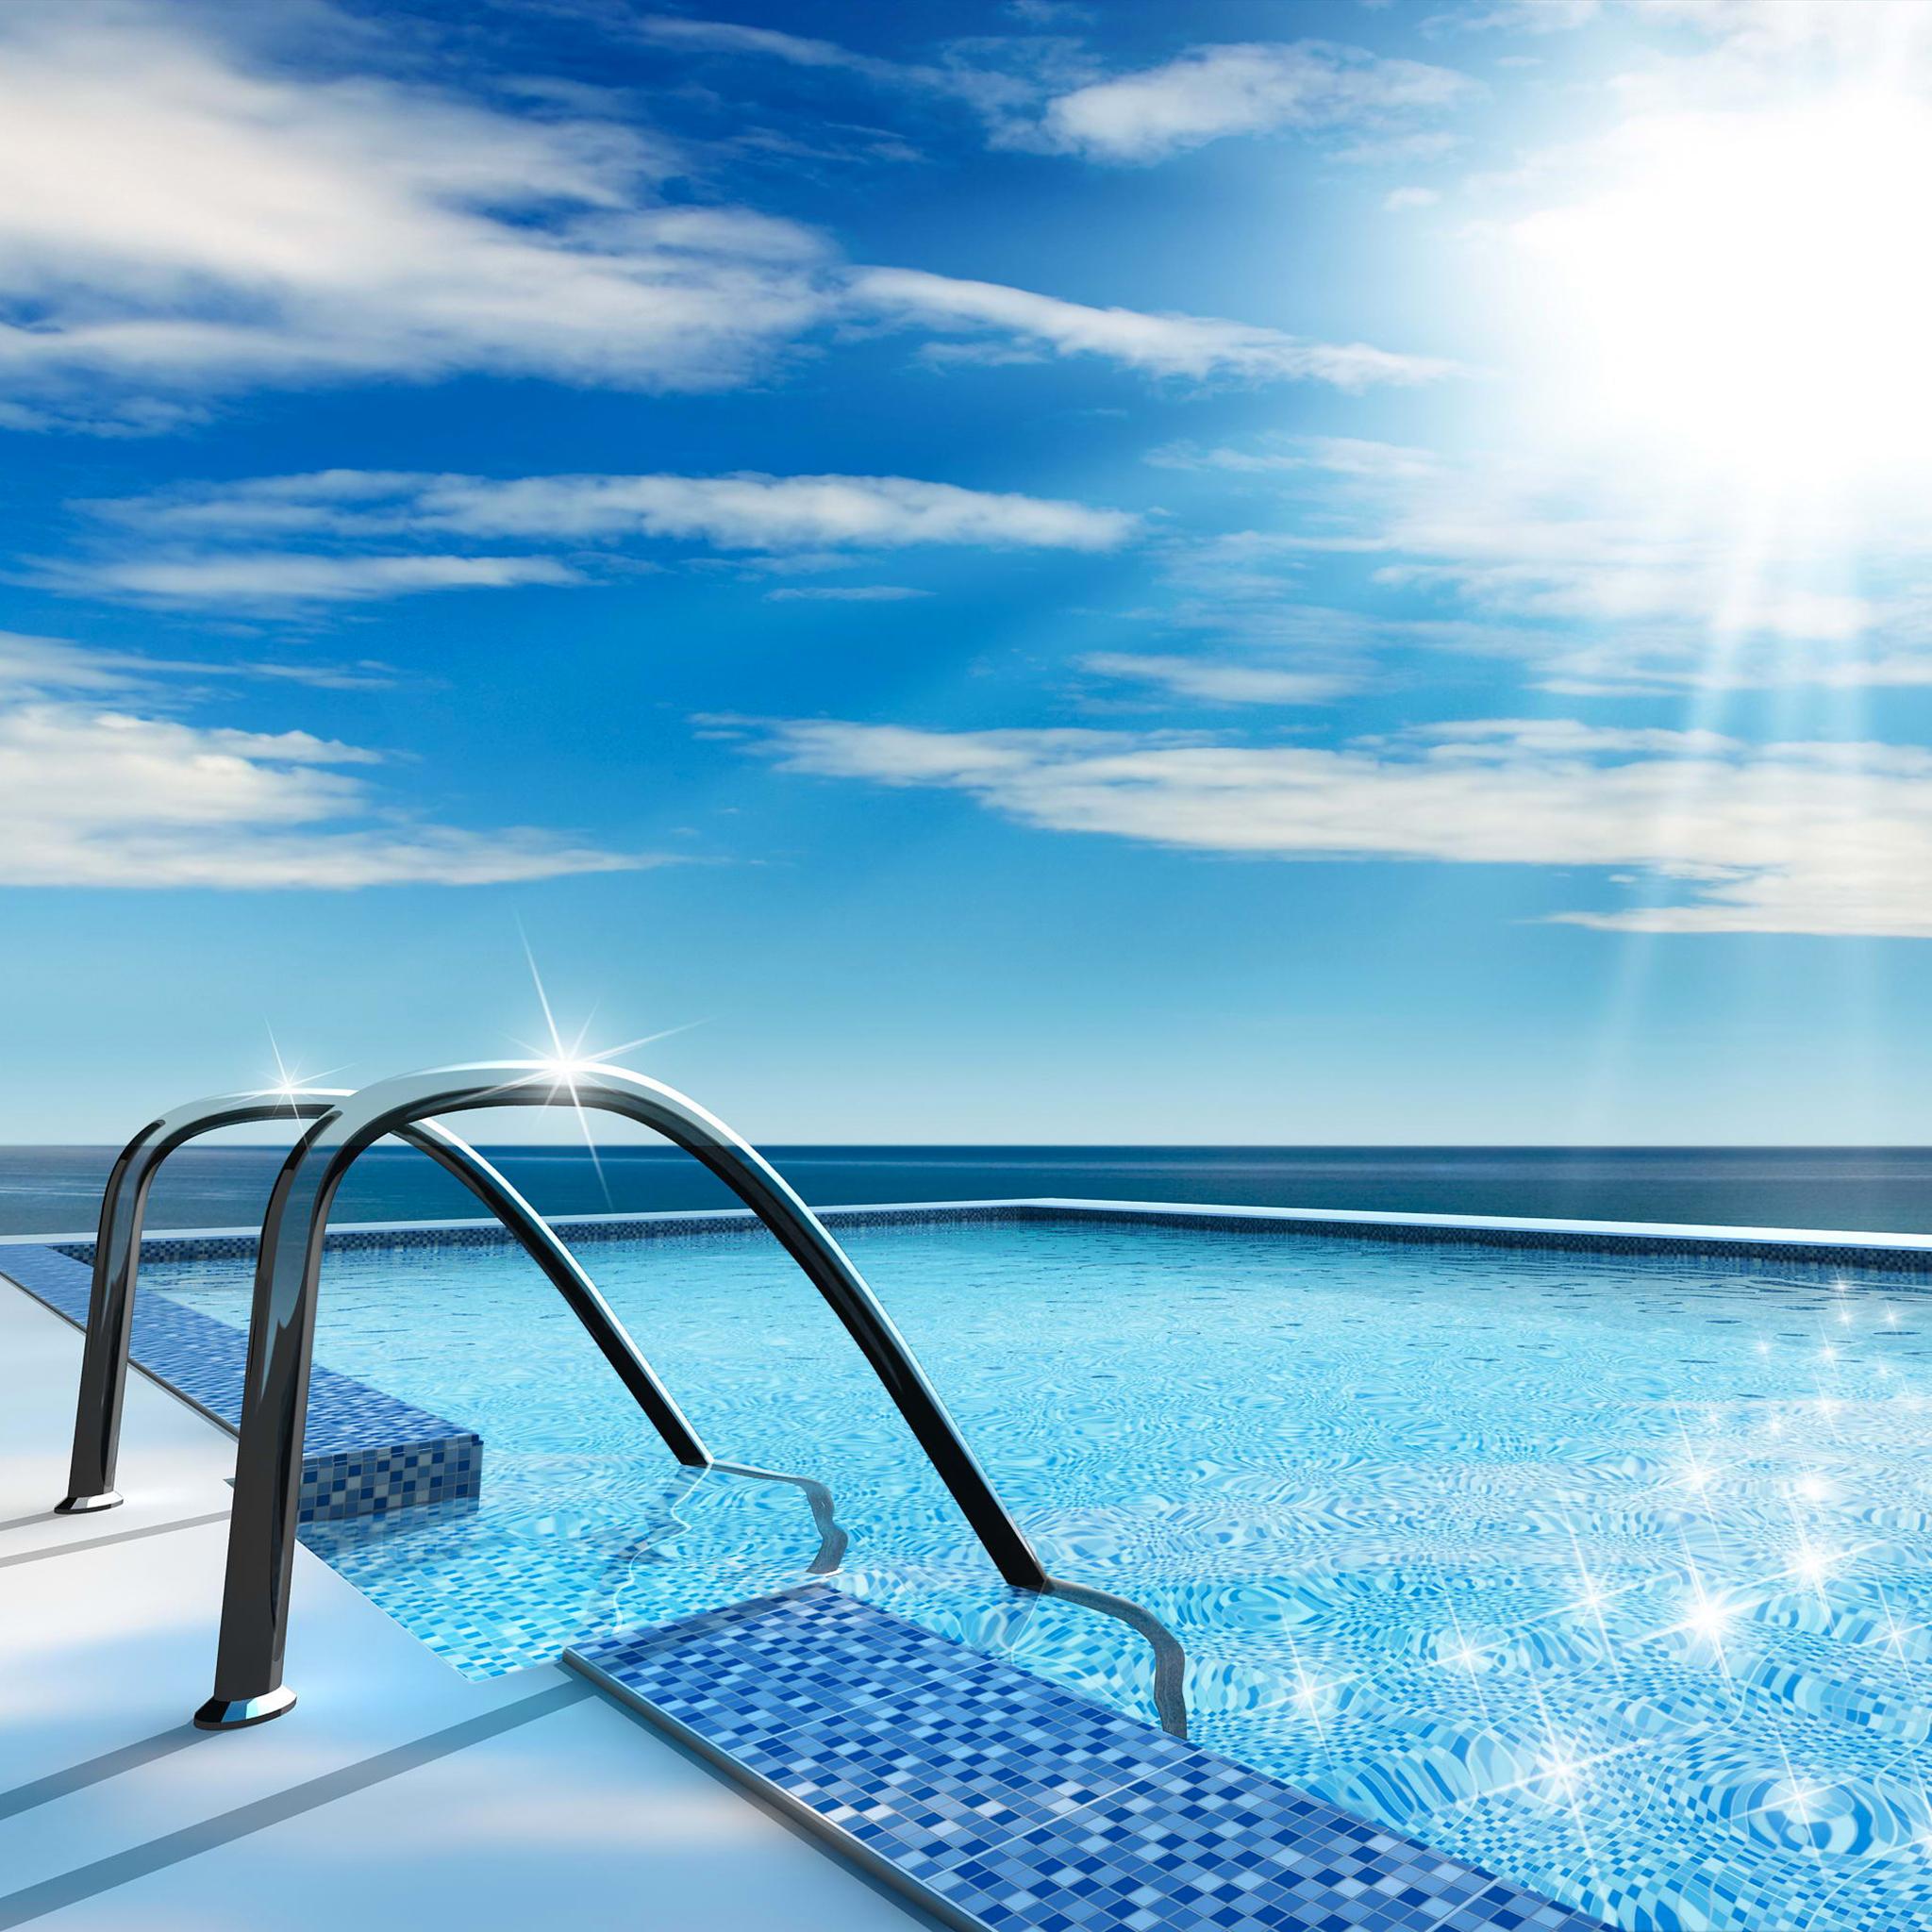 Swimming Pool Glittering Water 3Wallpapers iPad Retina Swimming Pool Glittering Water   iPad Retina